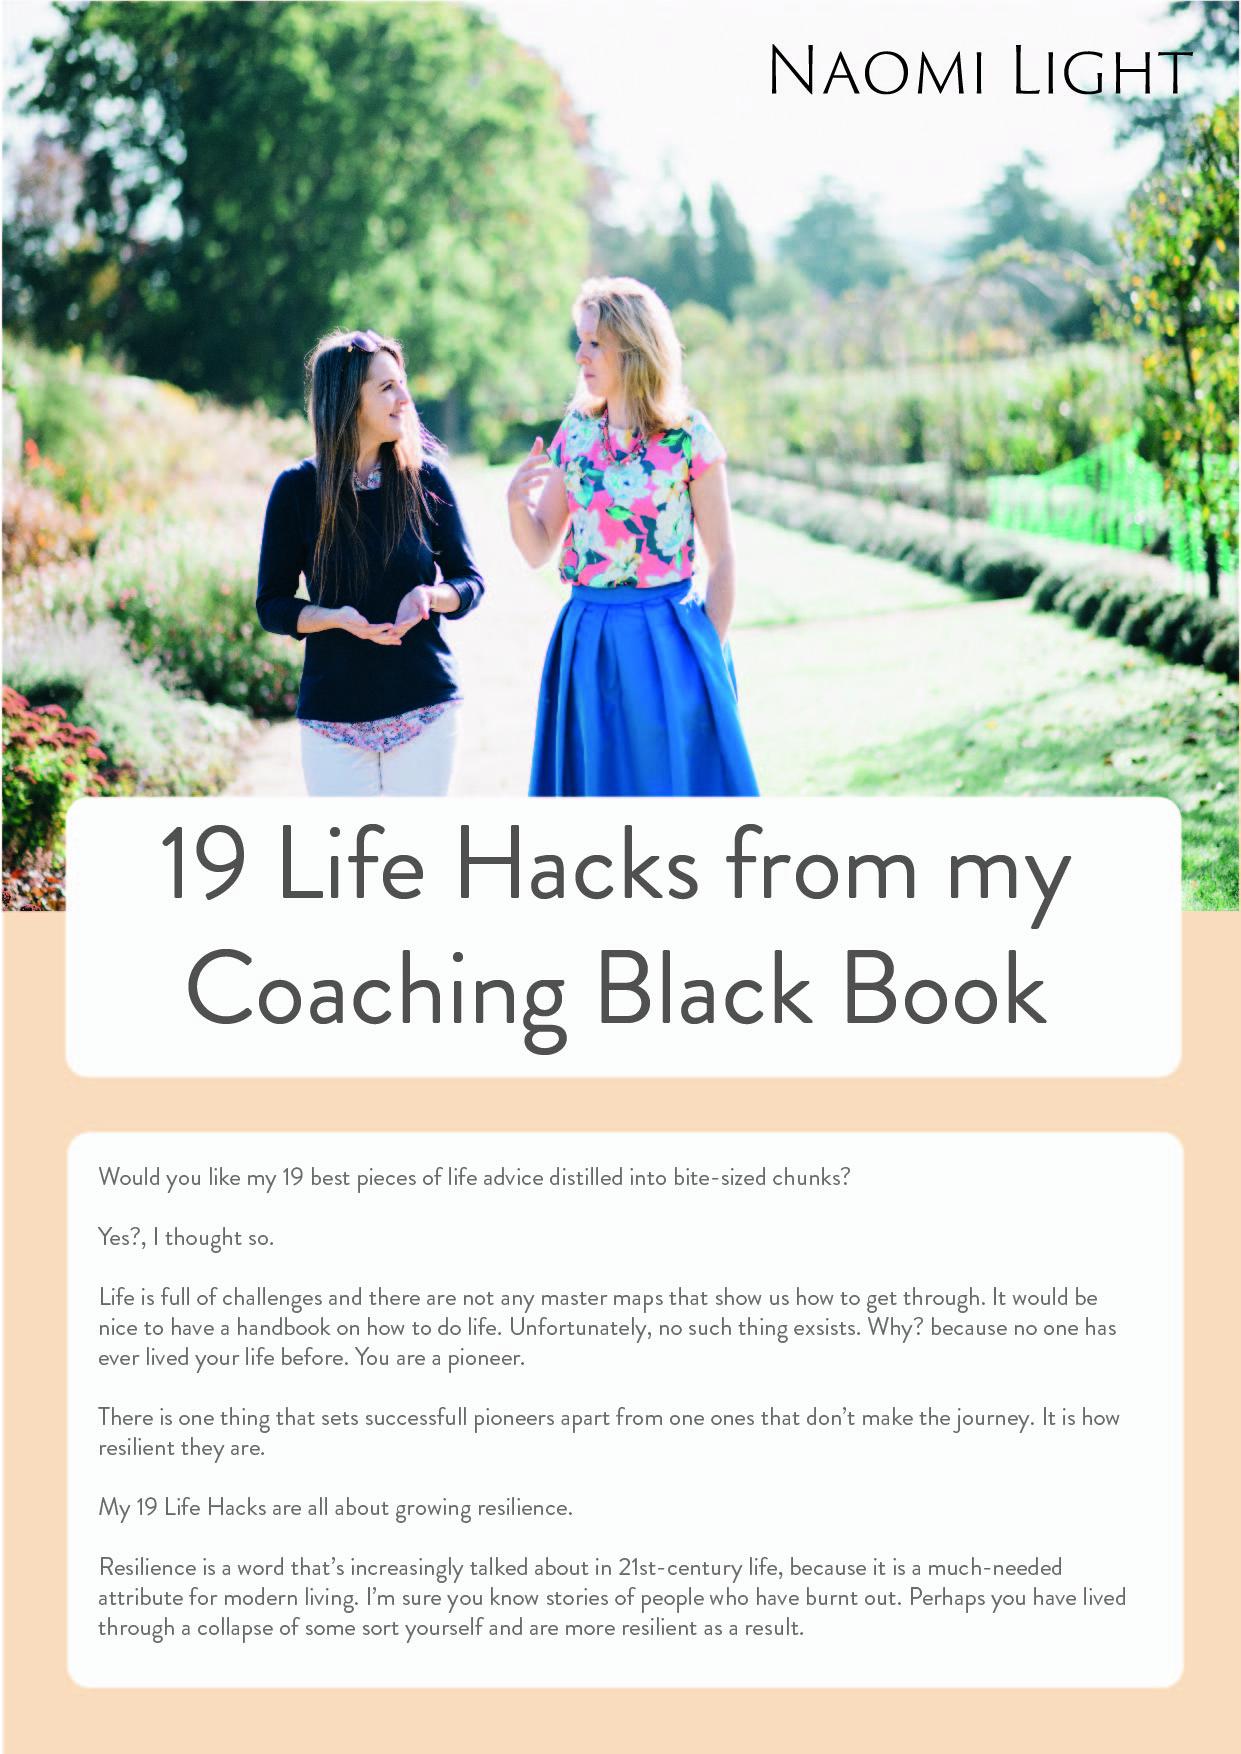 19 Life Hacks from my coaching black book-01.jpg